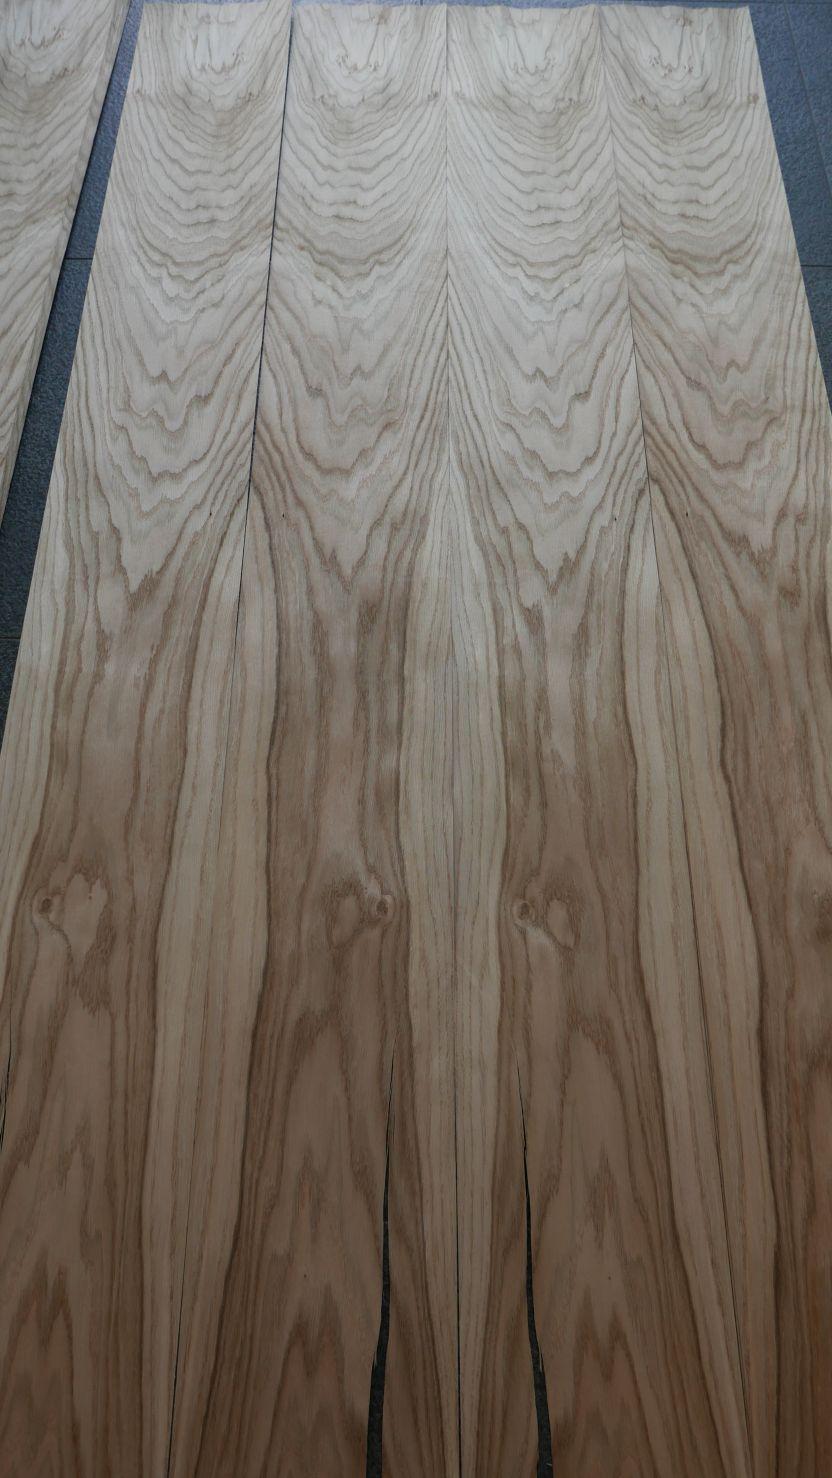 A0177-3 Eiken 24,5-28×155-196cm 30st